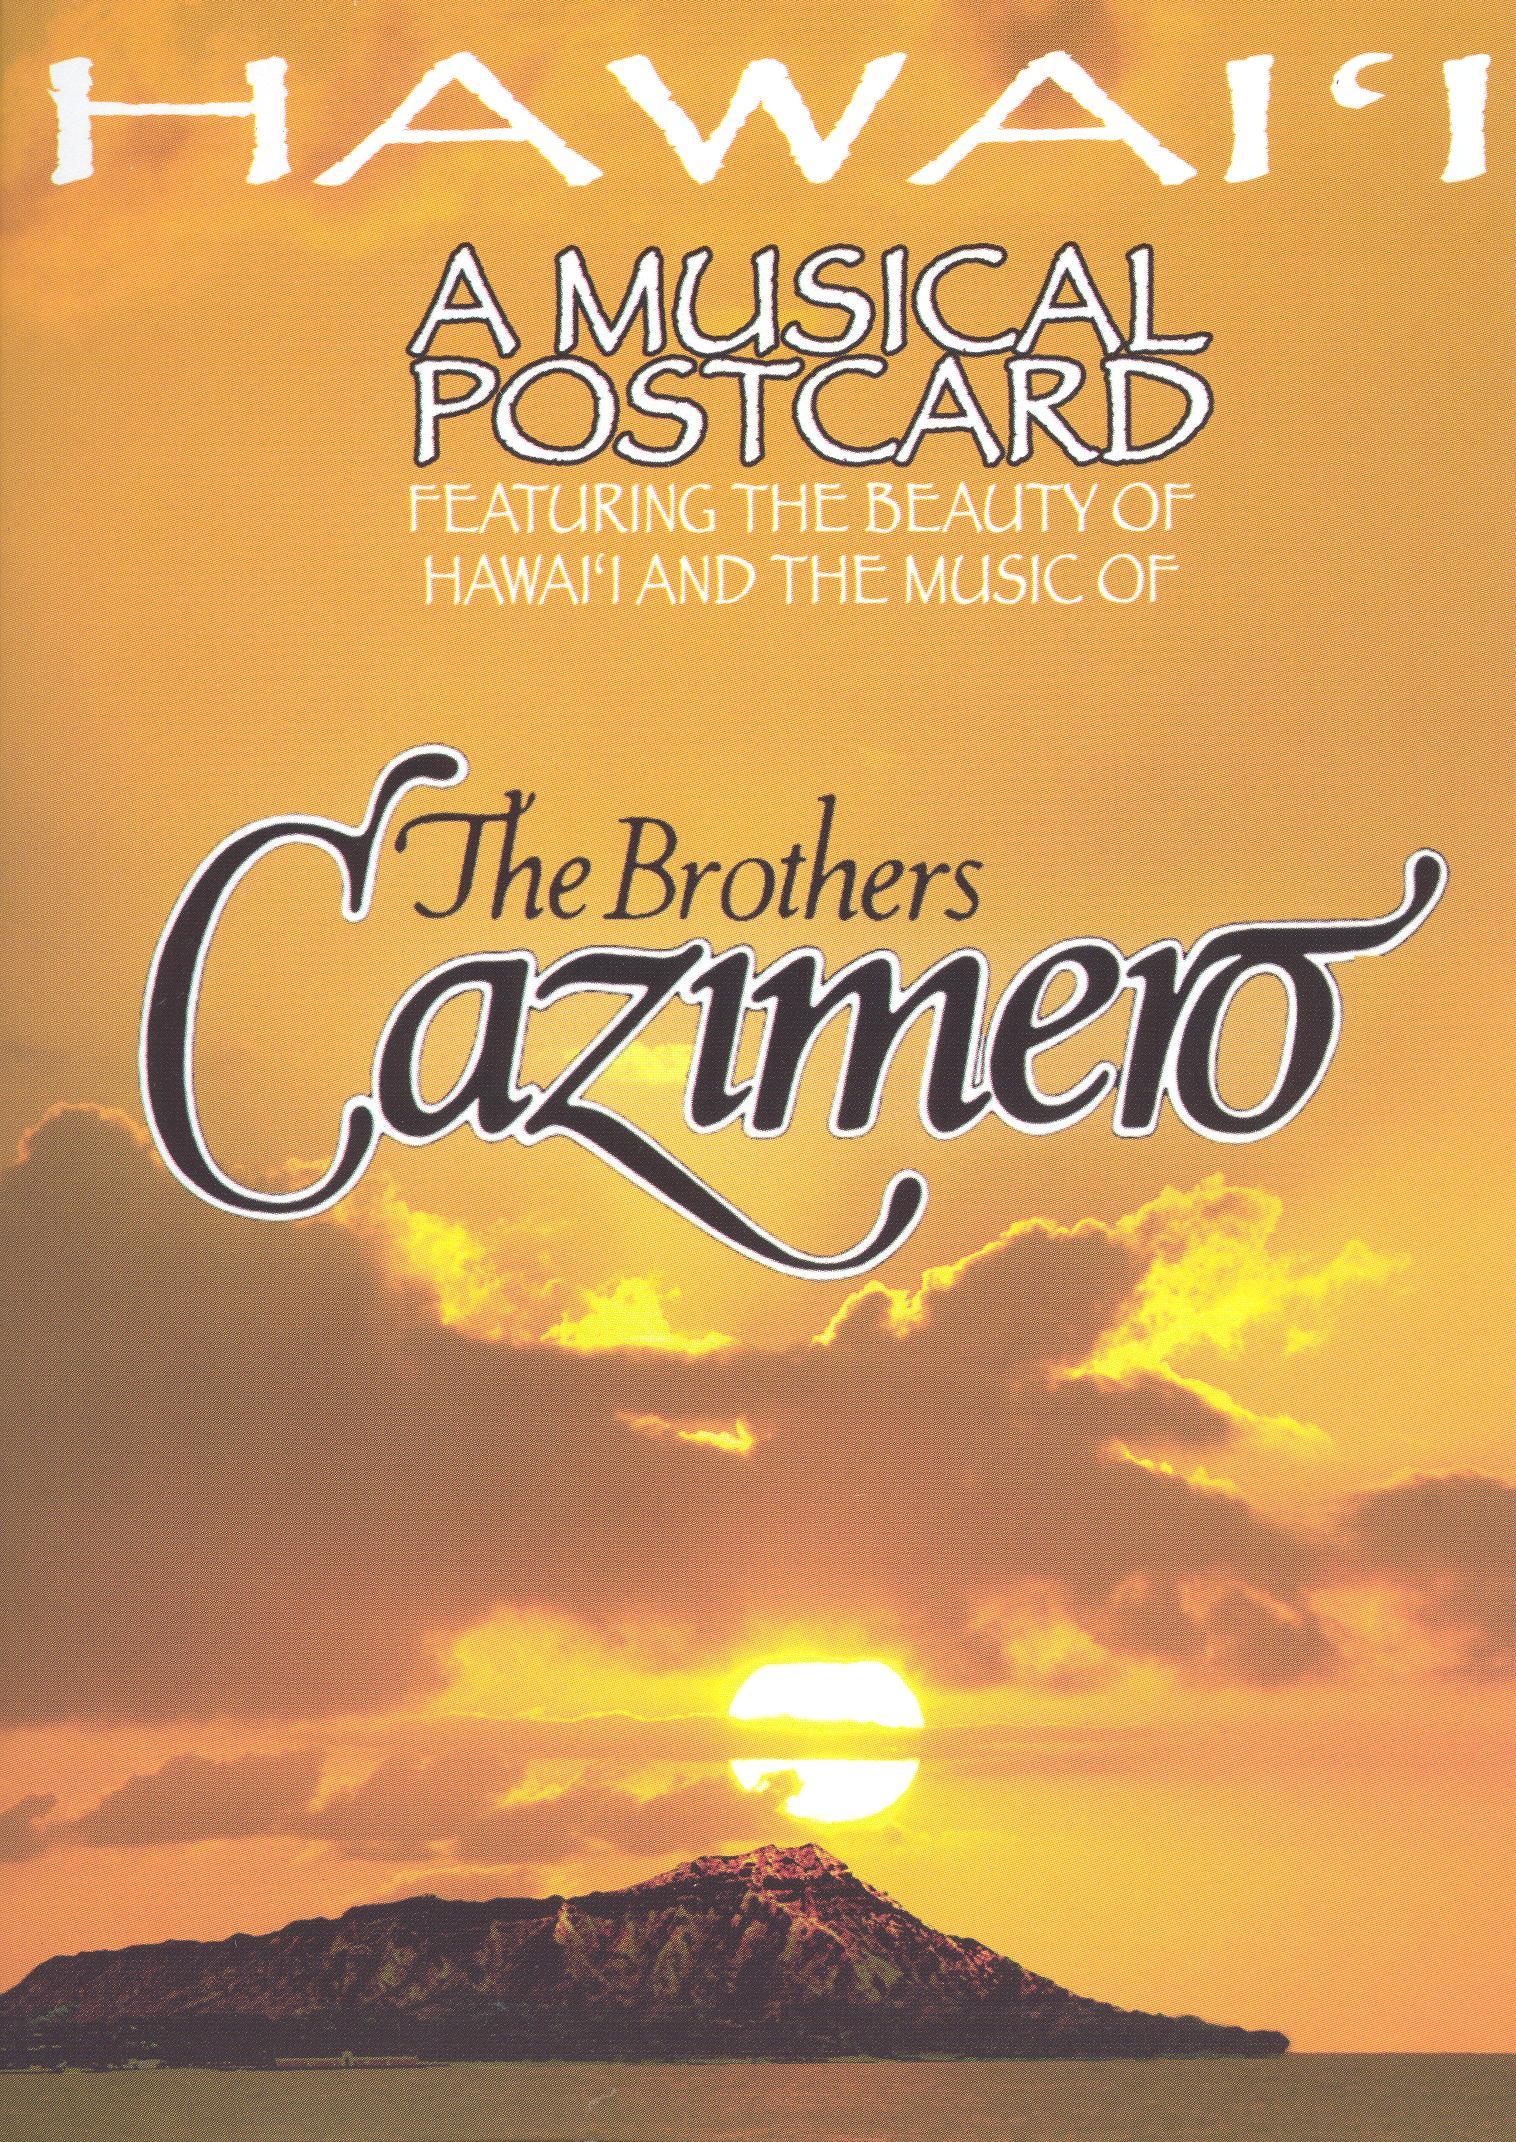 The Brothers Cazimero: Hawai'i a Musical Postcard